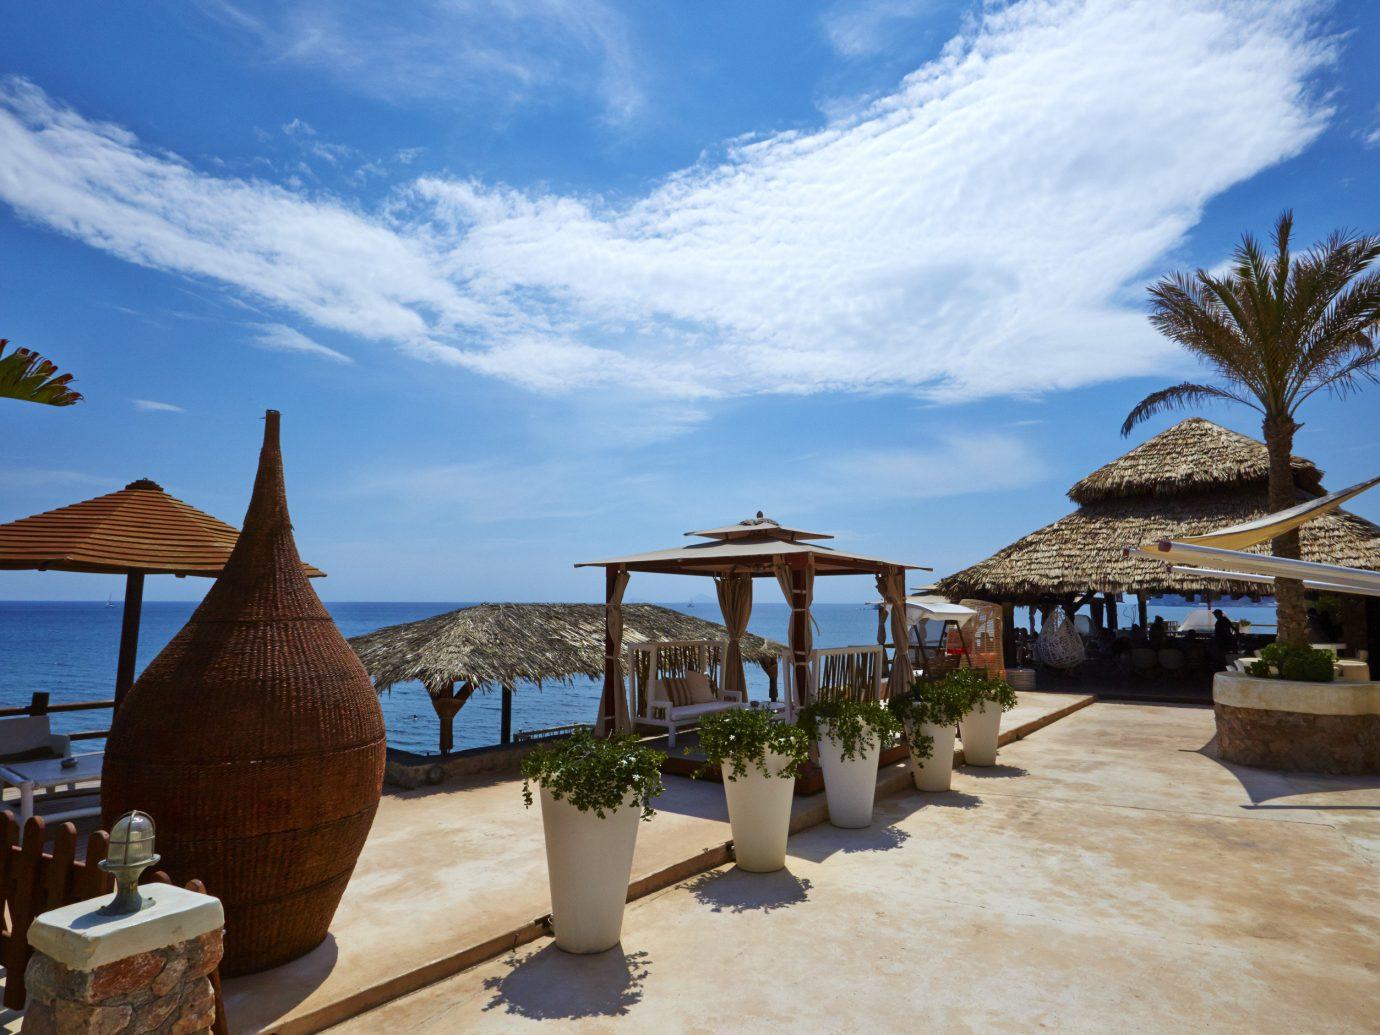 Trip Ideas sky outdoor Resort Beach vacation estate Sea tourism Ocean Coast arecales caribbean Villa bay shade day sandy